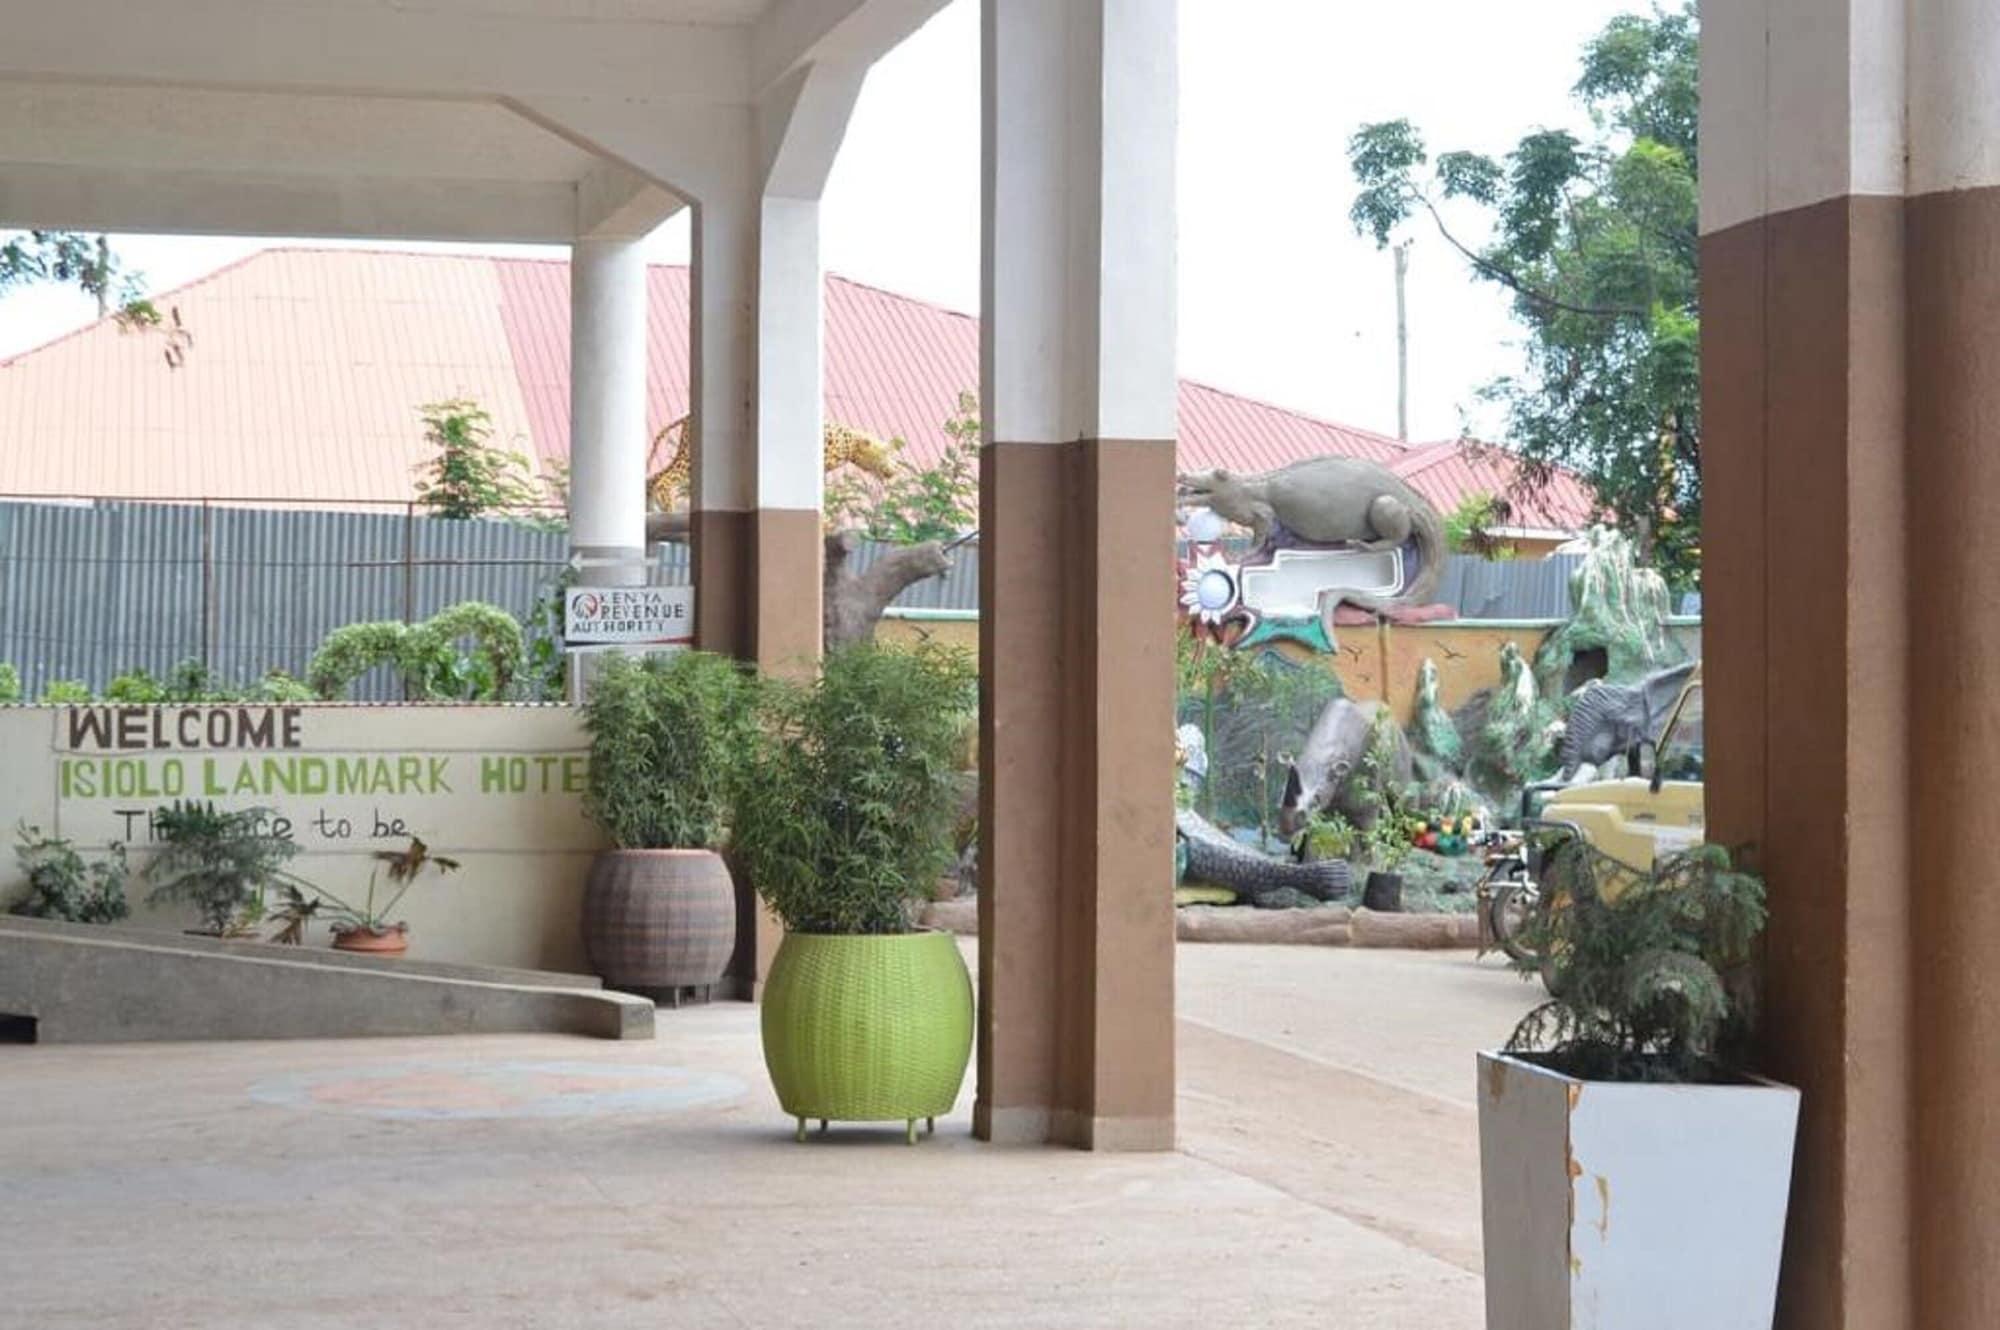 Isiolo landmark hotel, Isiolo North